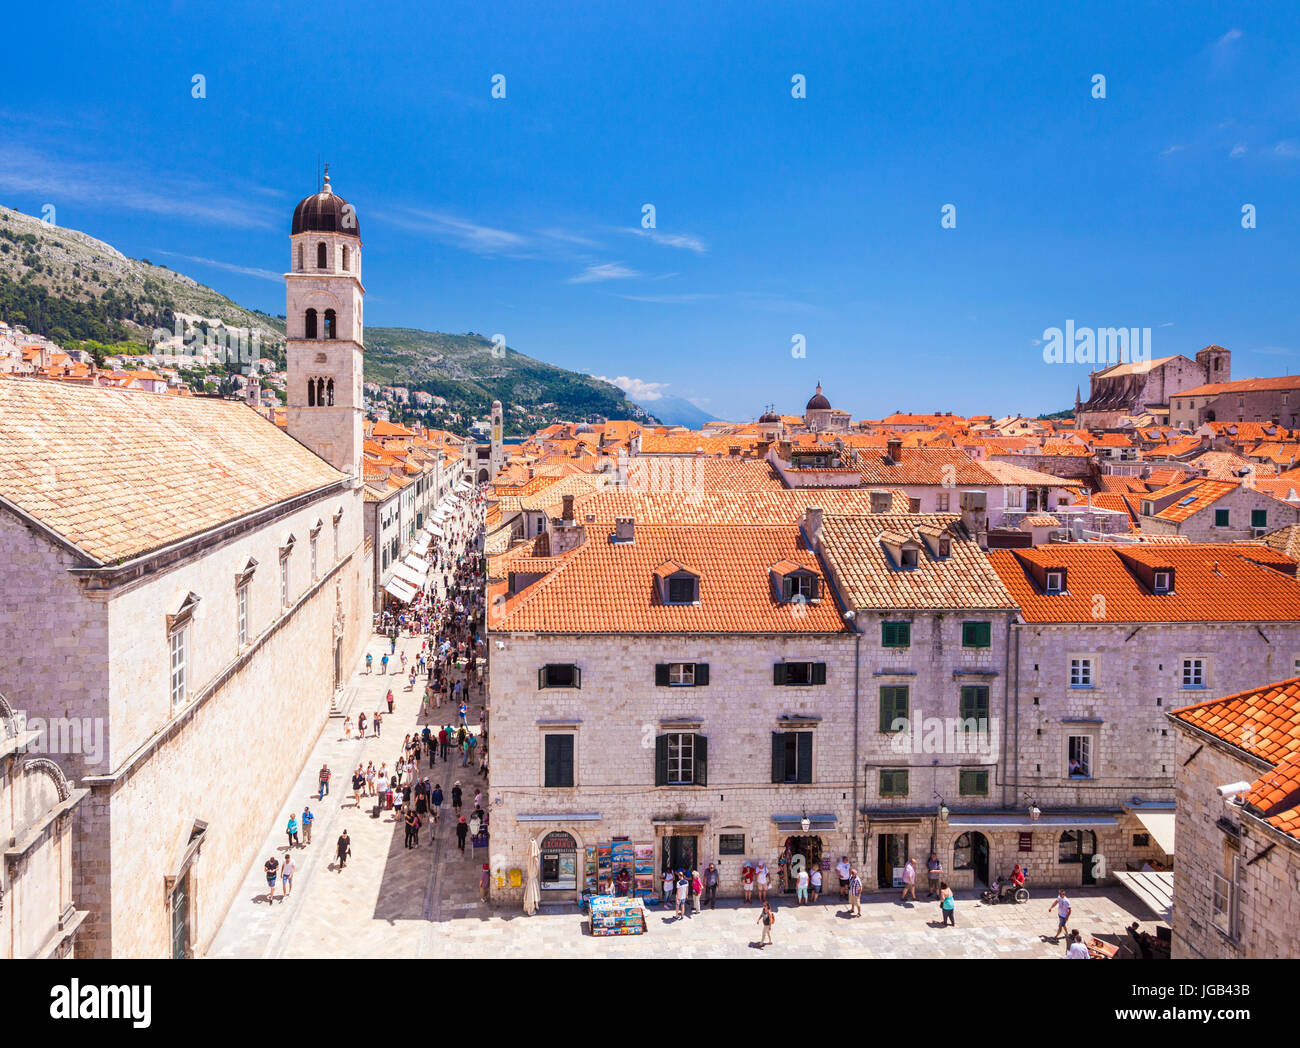 Croatia Dubrovnik Croatia view from city walls of the stradun main street dubrovnik placa dubrovnik stradun dubrovnik - Stock Image